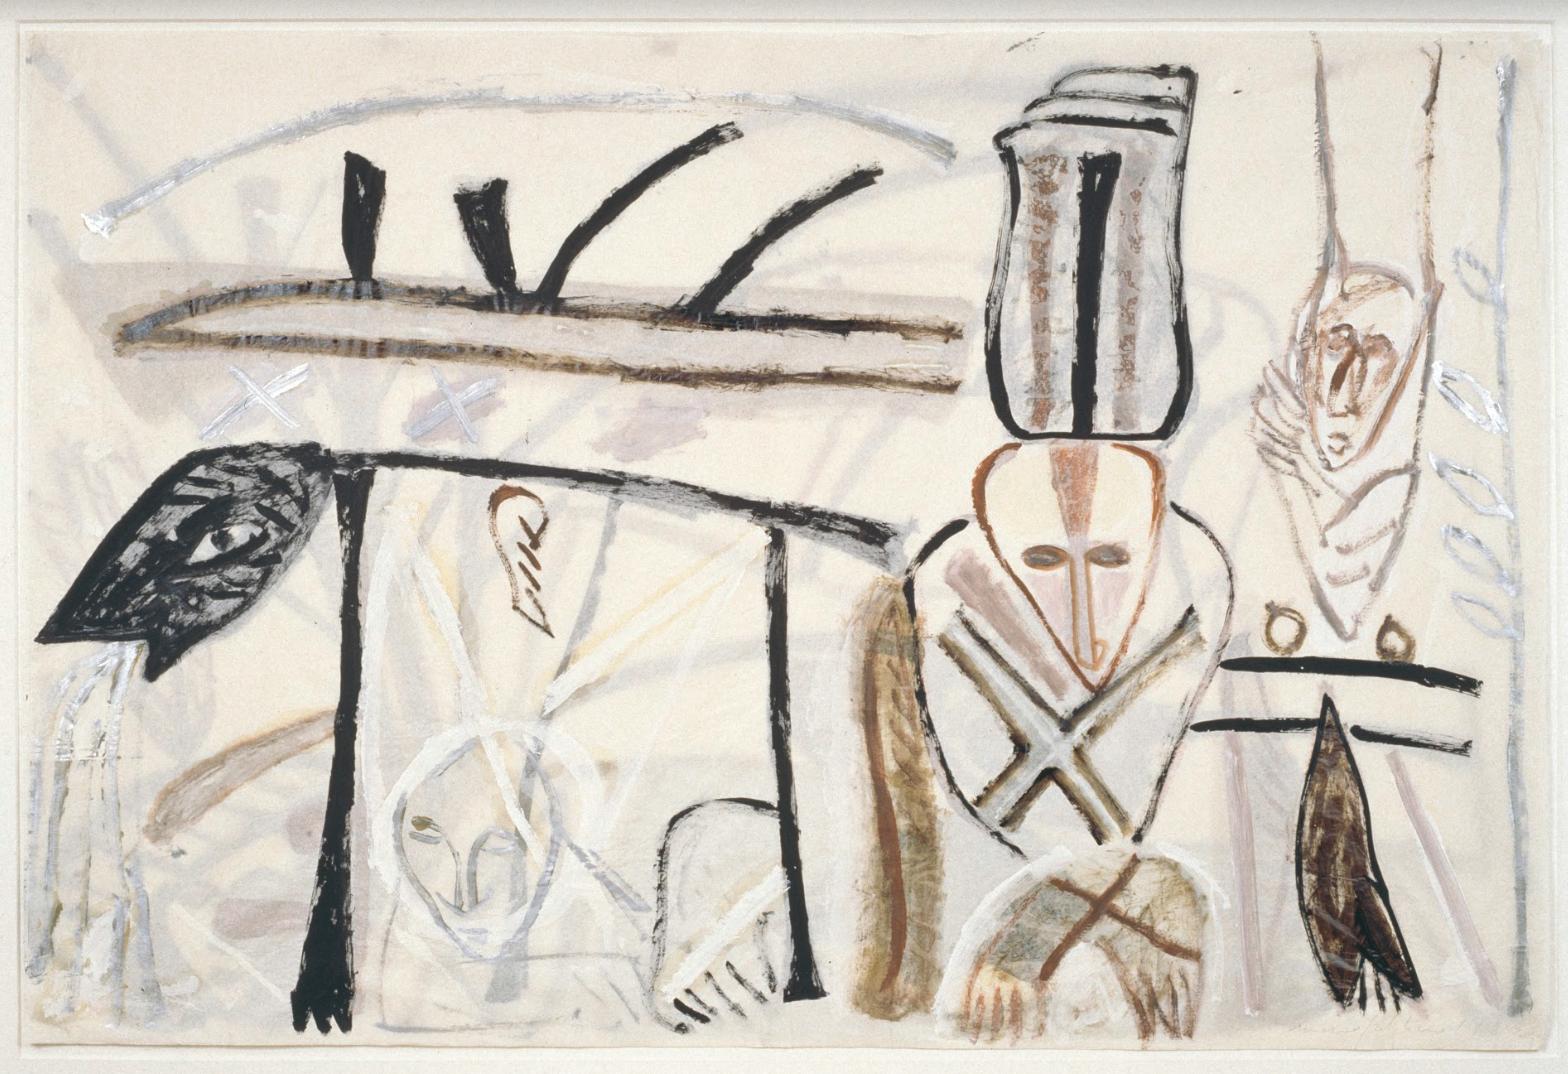 Mimmo Paladino, Senza titolo, 1992